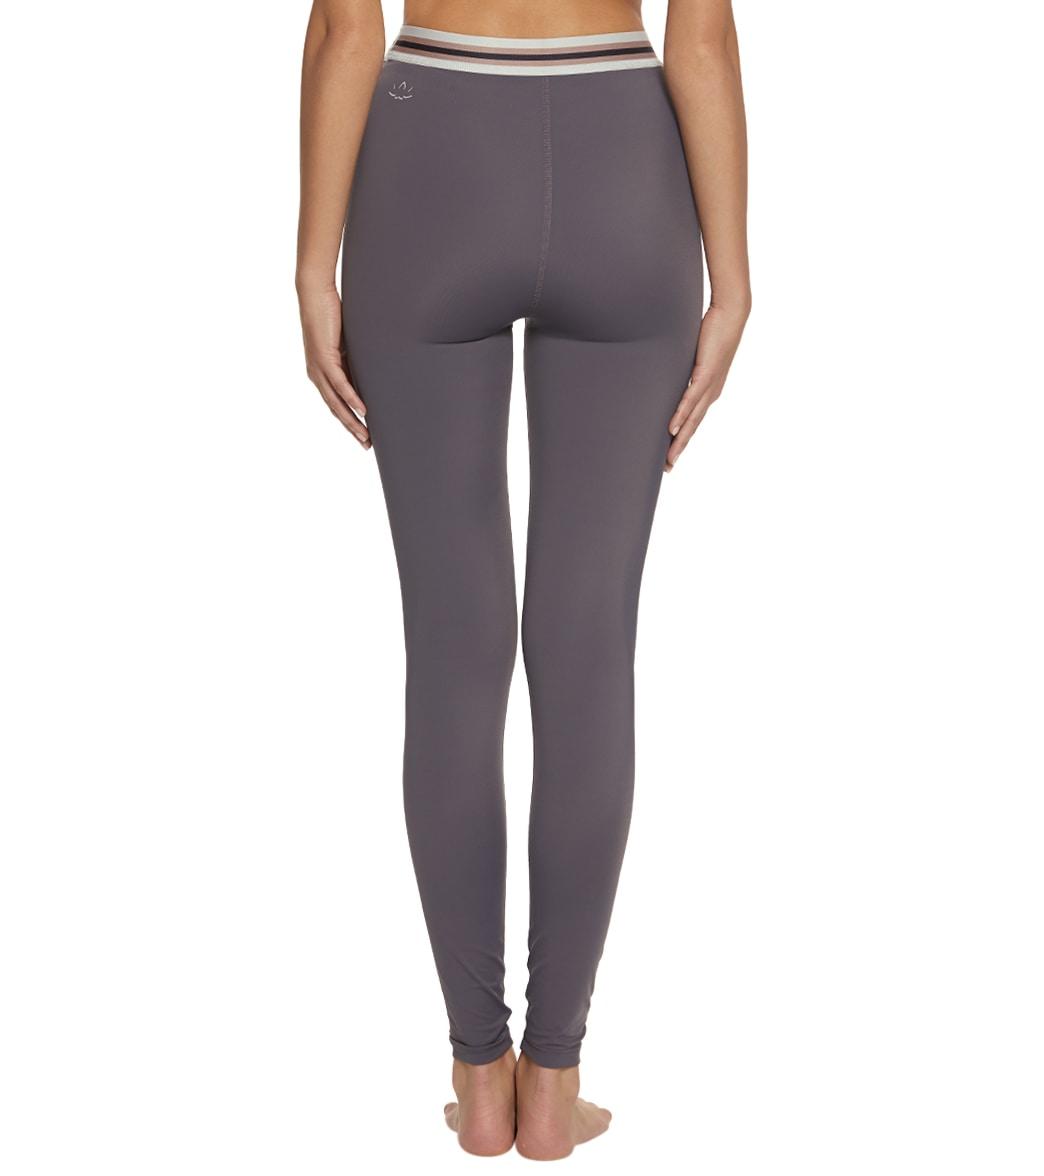 b15f229c2d Beyond Yoga Compression One More Stripe High Waisted Yoga Leggings ...